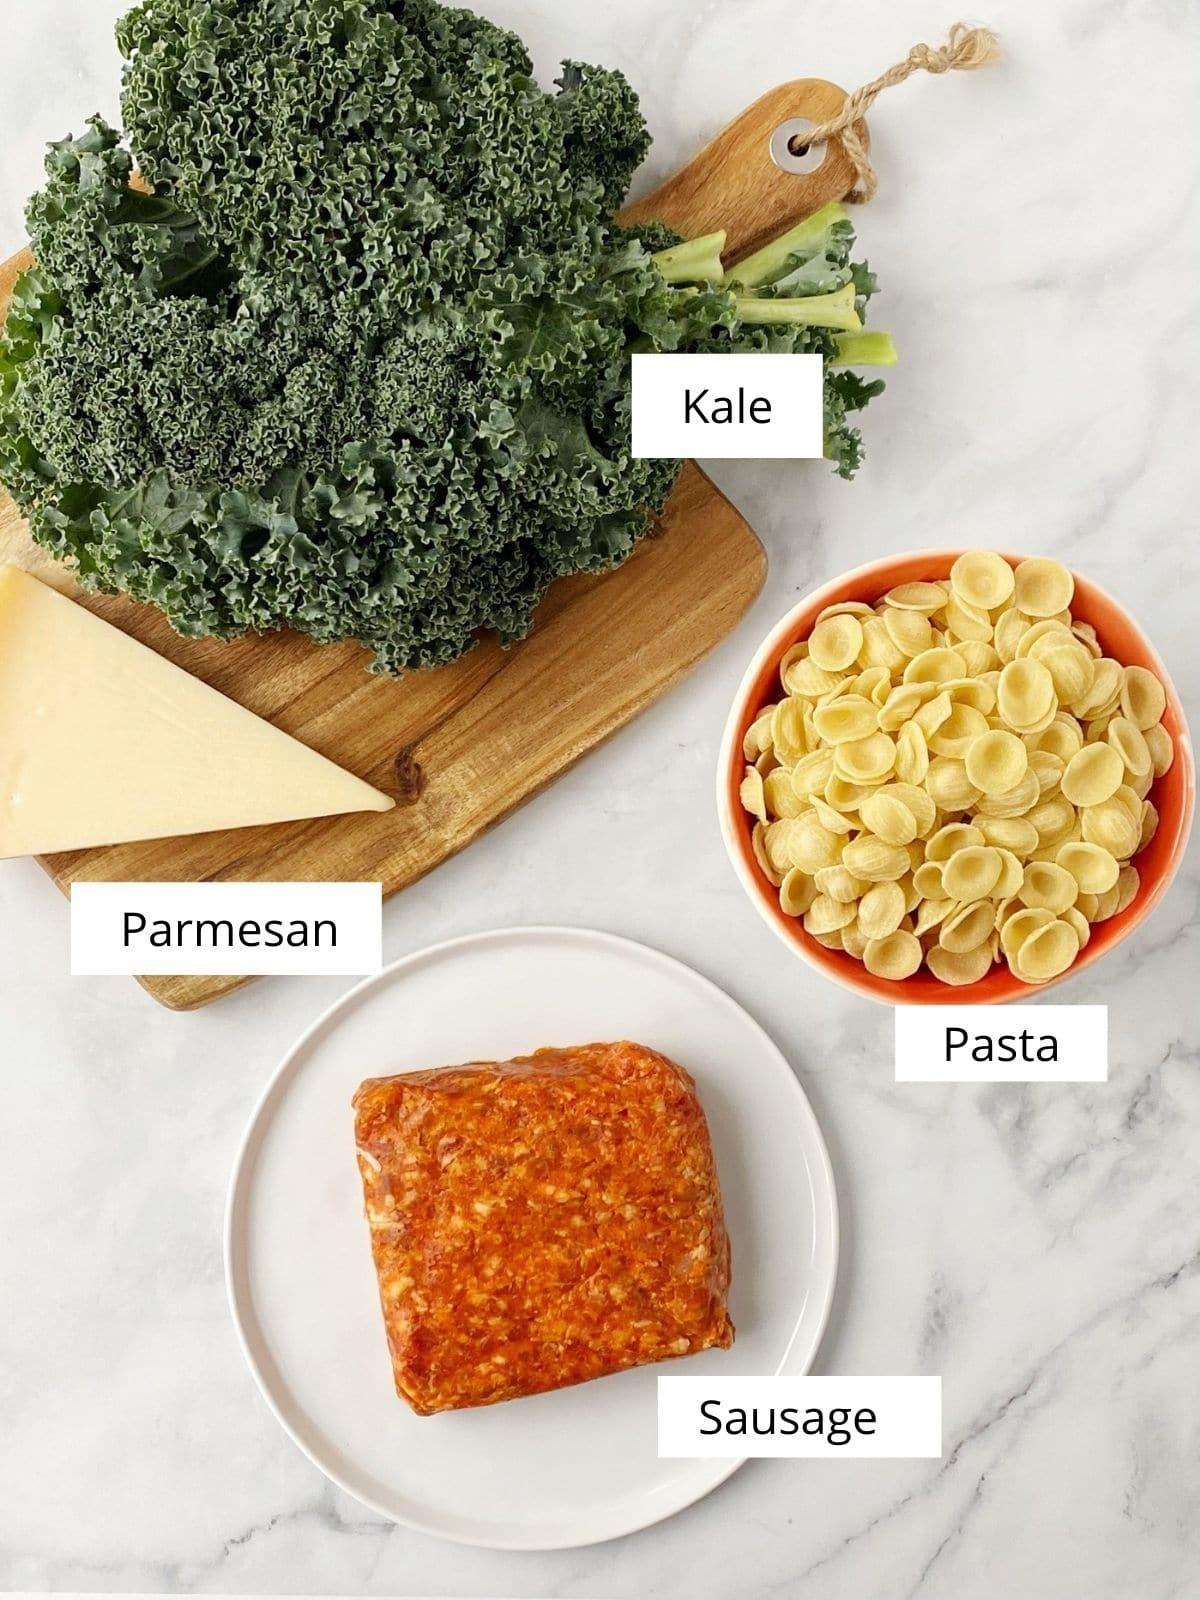 array of ingredients - kale, pasta, sausage, and parmesan